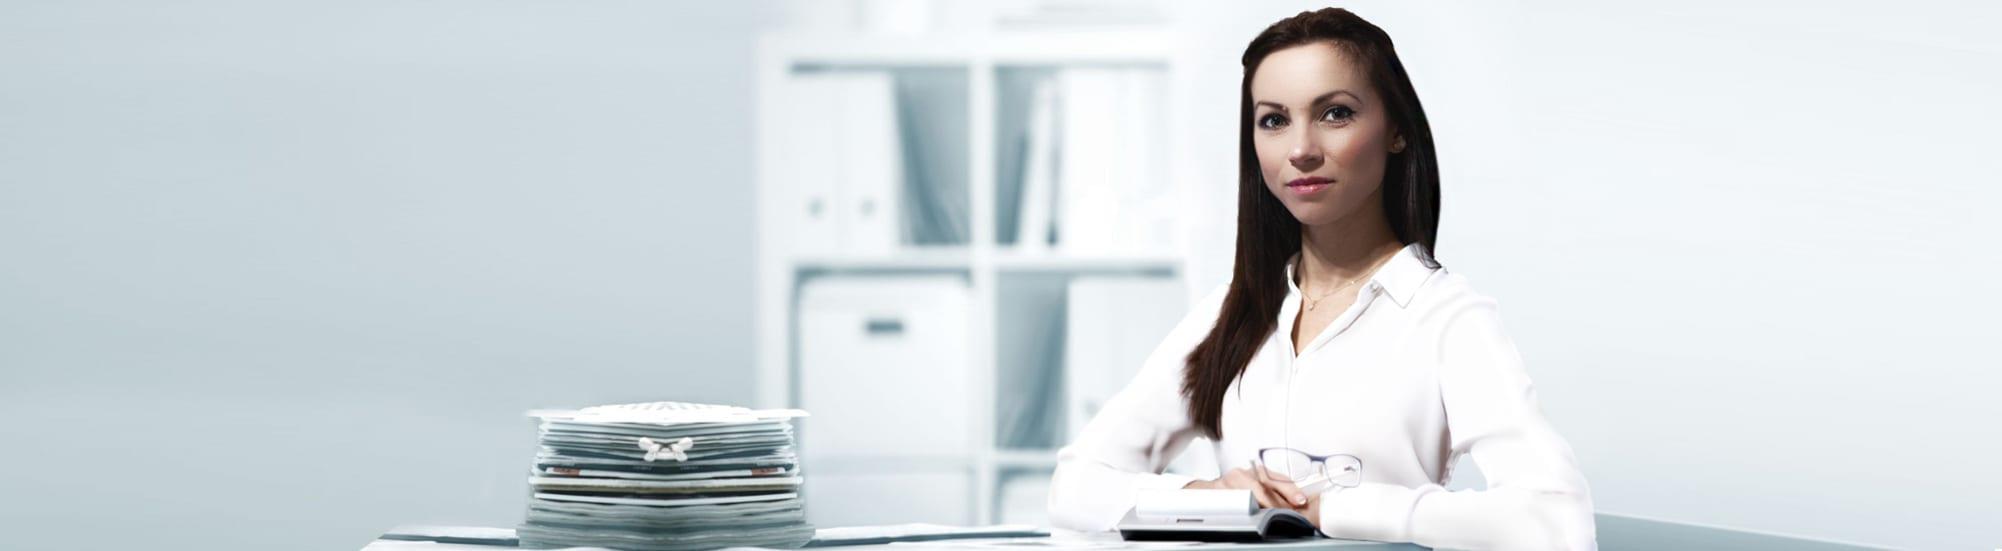 Wiktoria - accountant